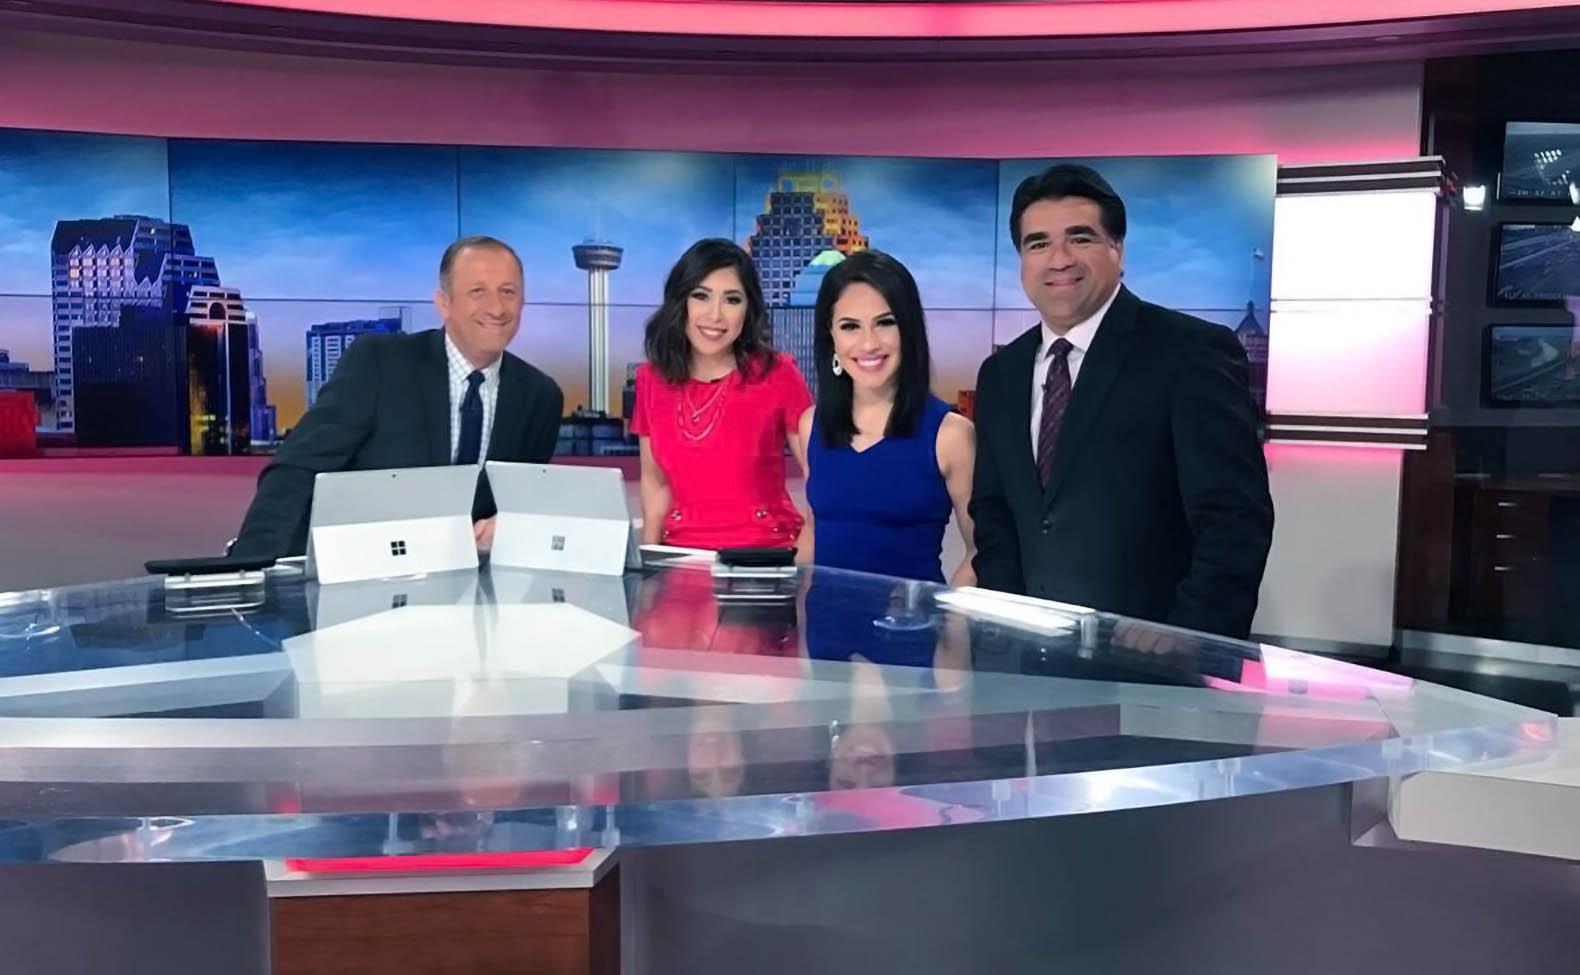 Paul Mireles, Audrey Castoreno, and Alexis on set